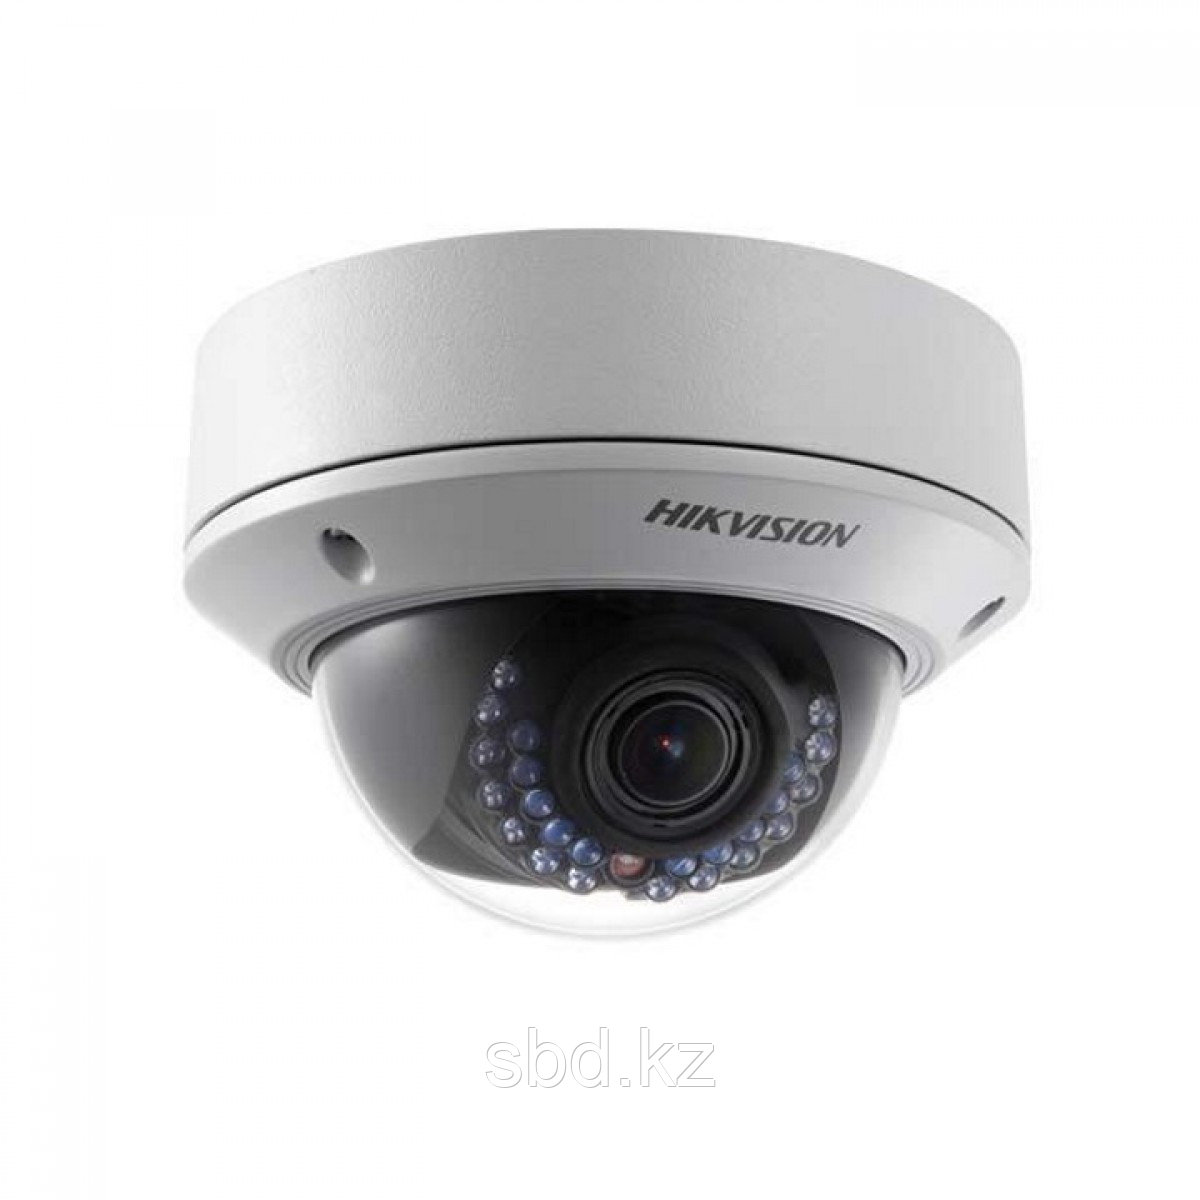 IP Камера видеонаблюдения Hikvision DS-2CD2722FWD-IS